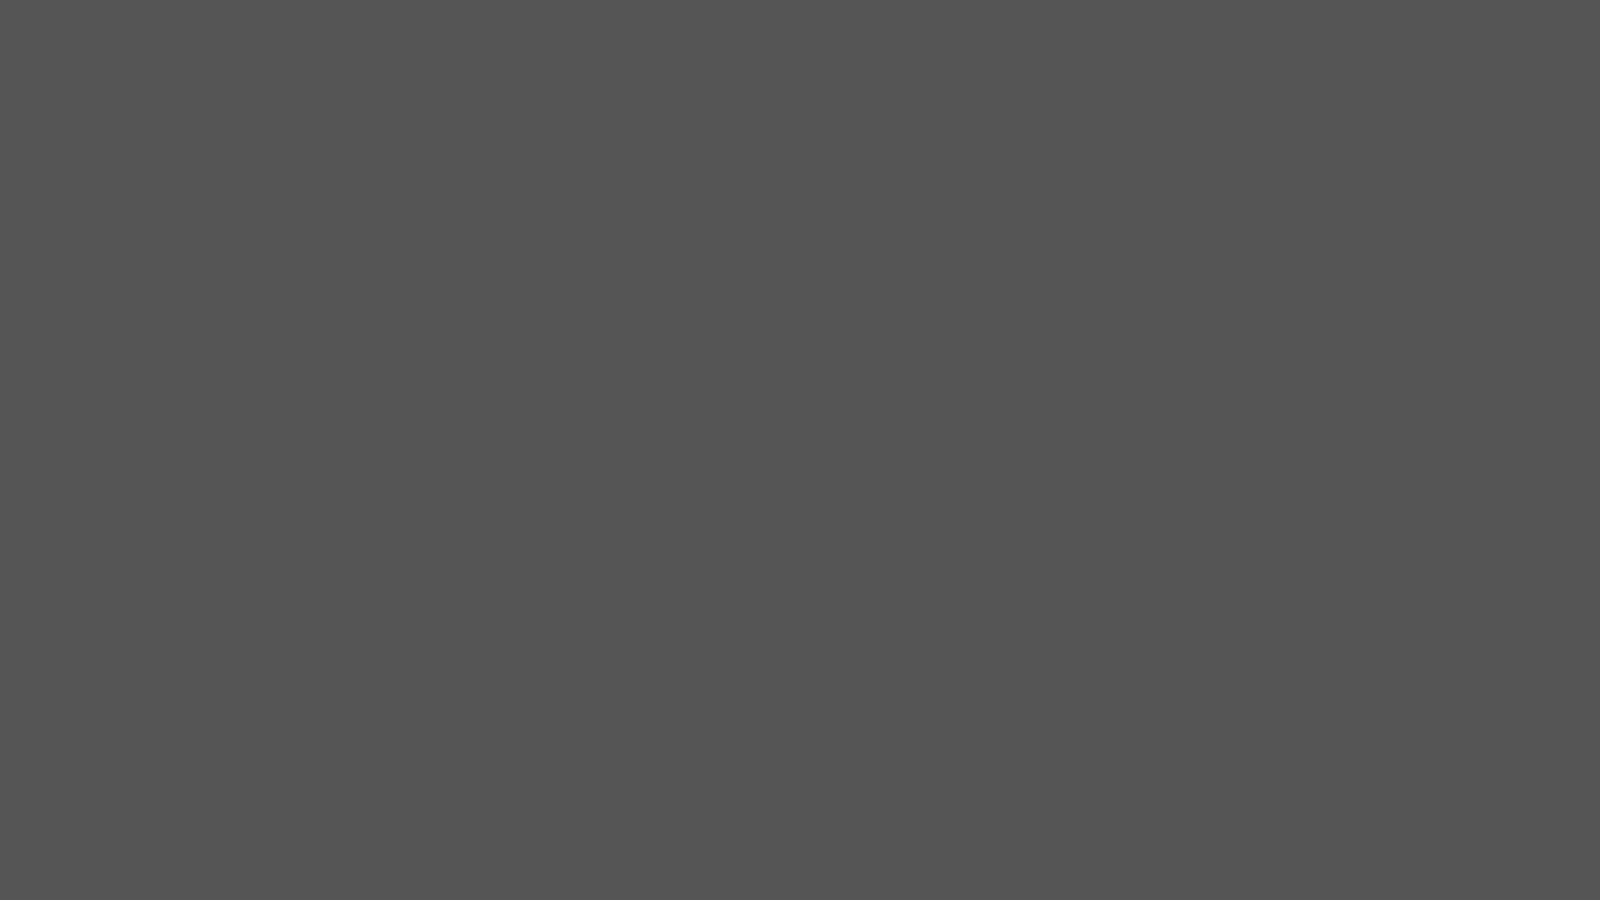 Grey Wallpaper Hd: 24 HD Solid Color Wallpapers